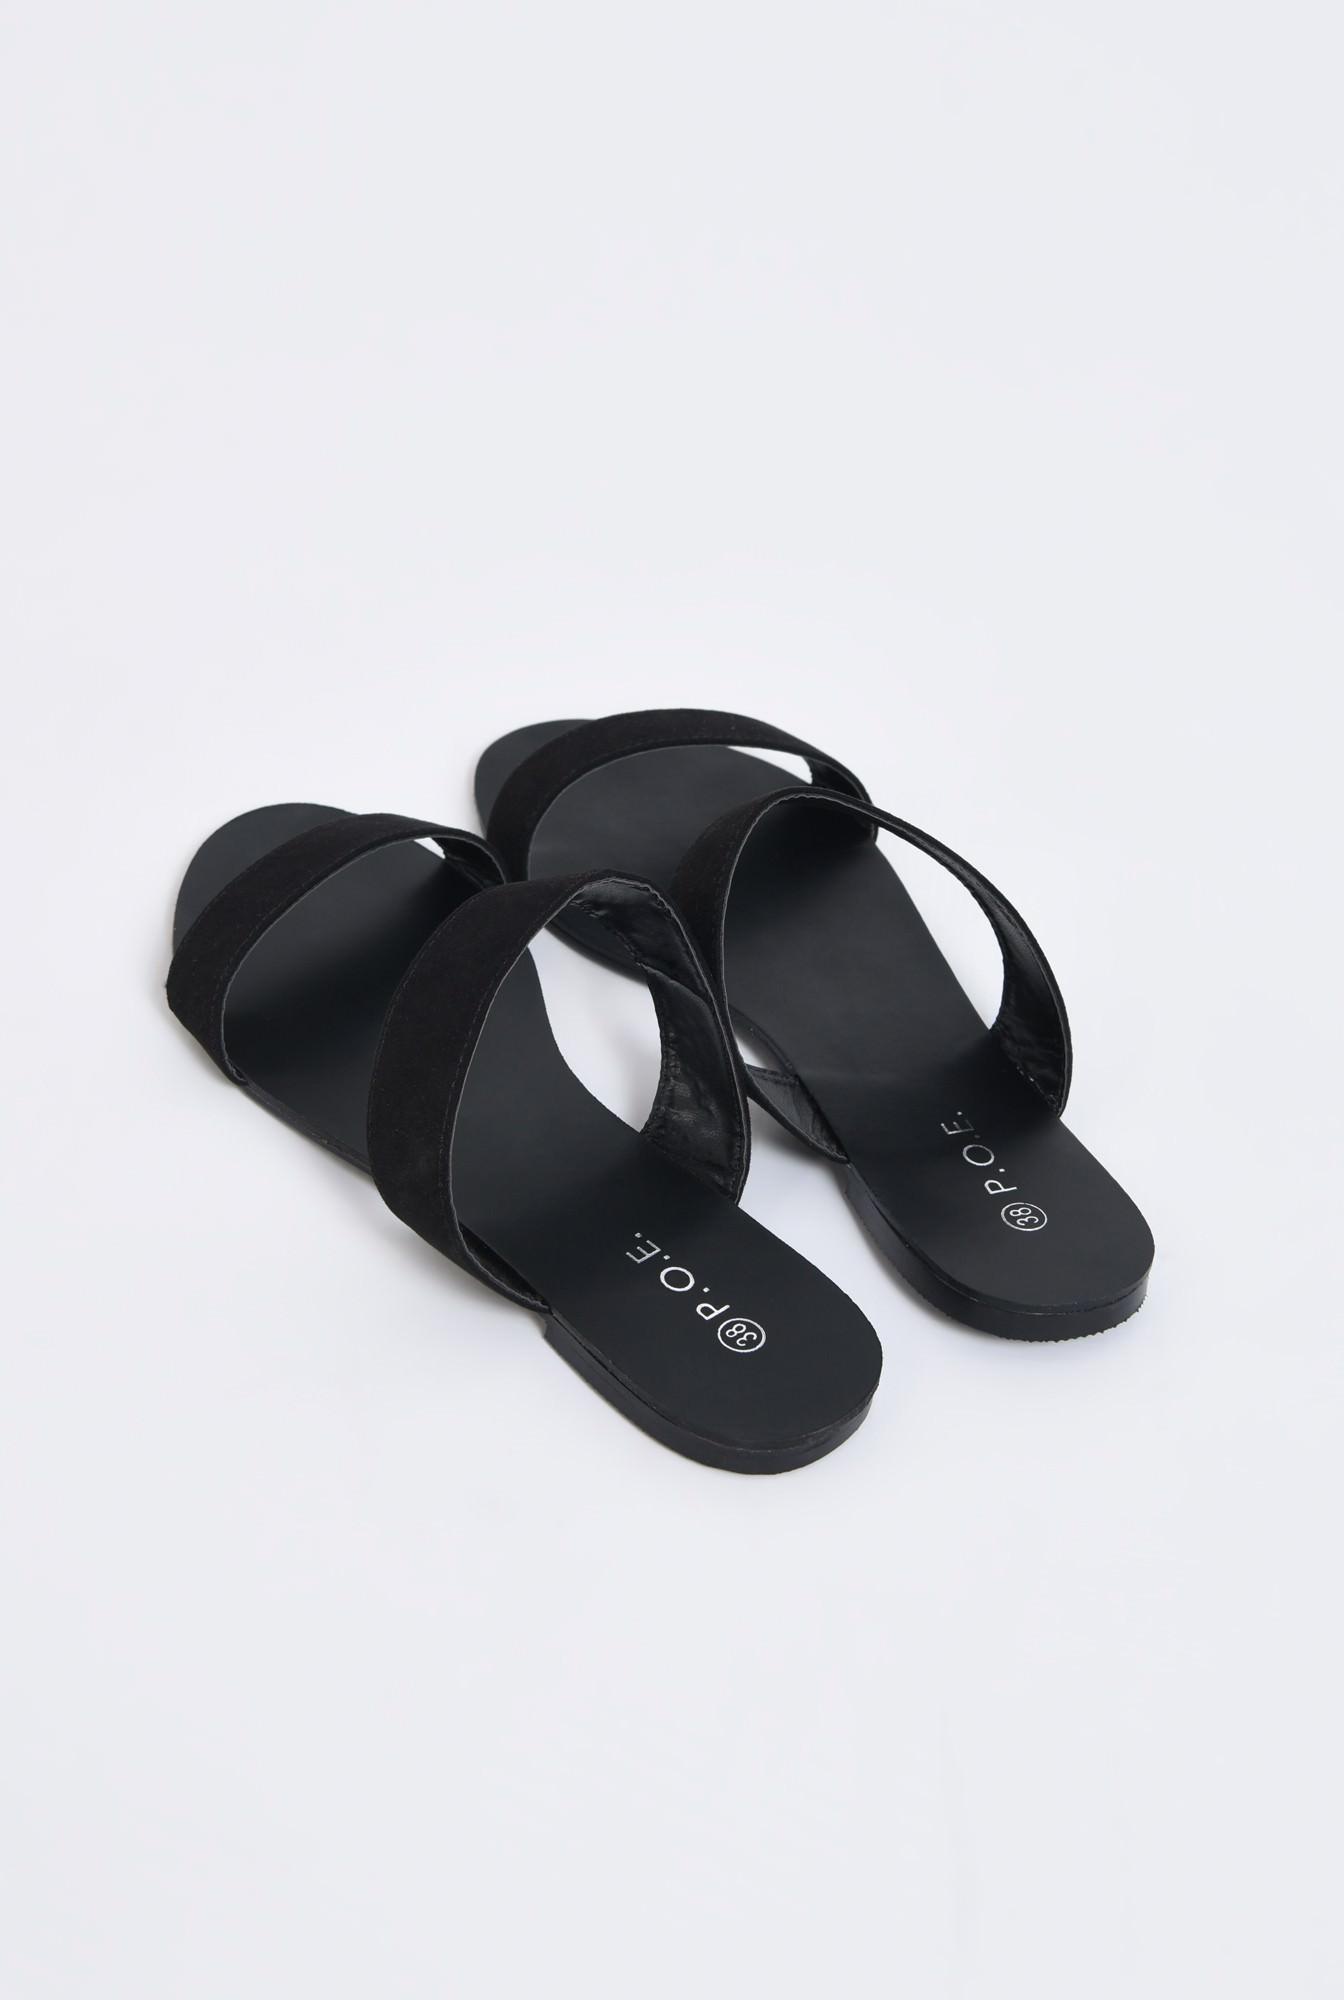 2 - papuci din velur, negru, talpa joasa, barete late